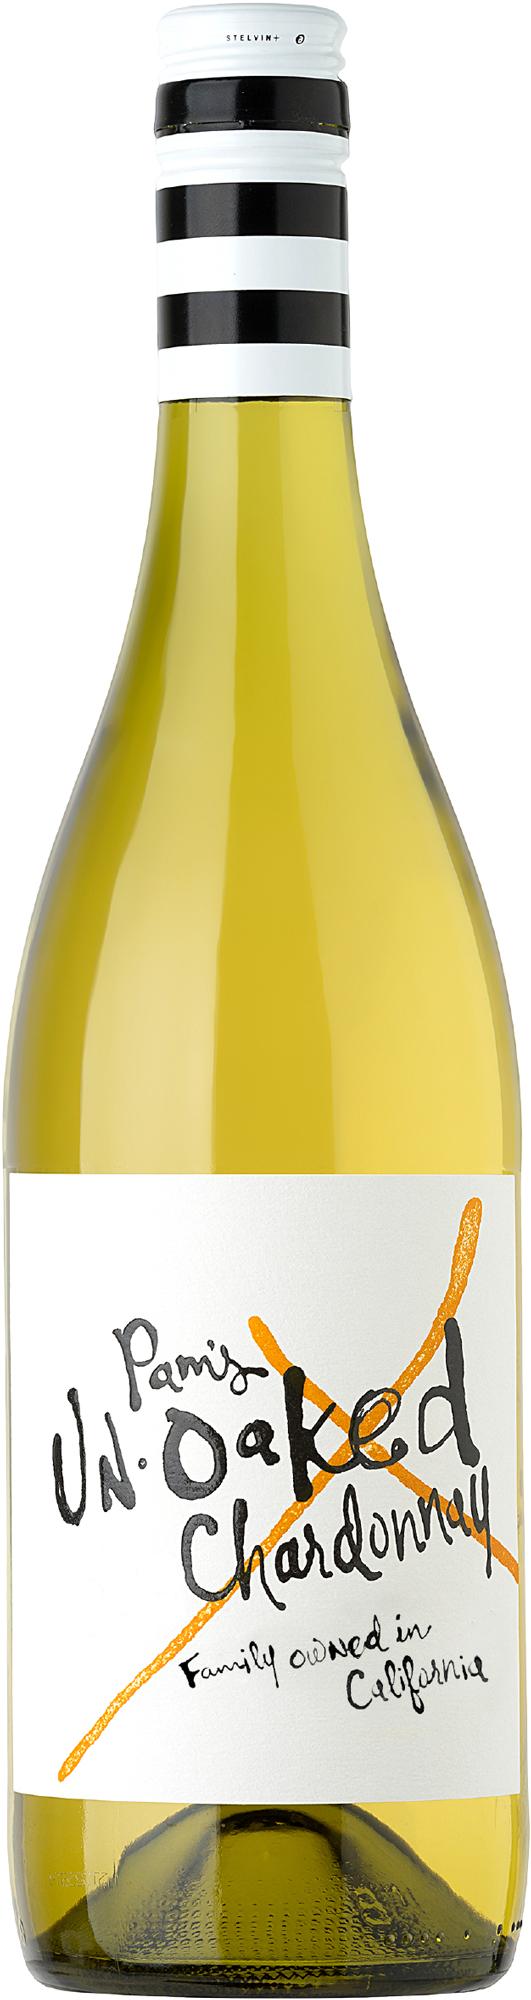 2018-Pams-Un-Oaked-Chardonnay